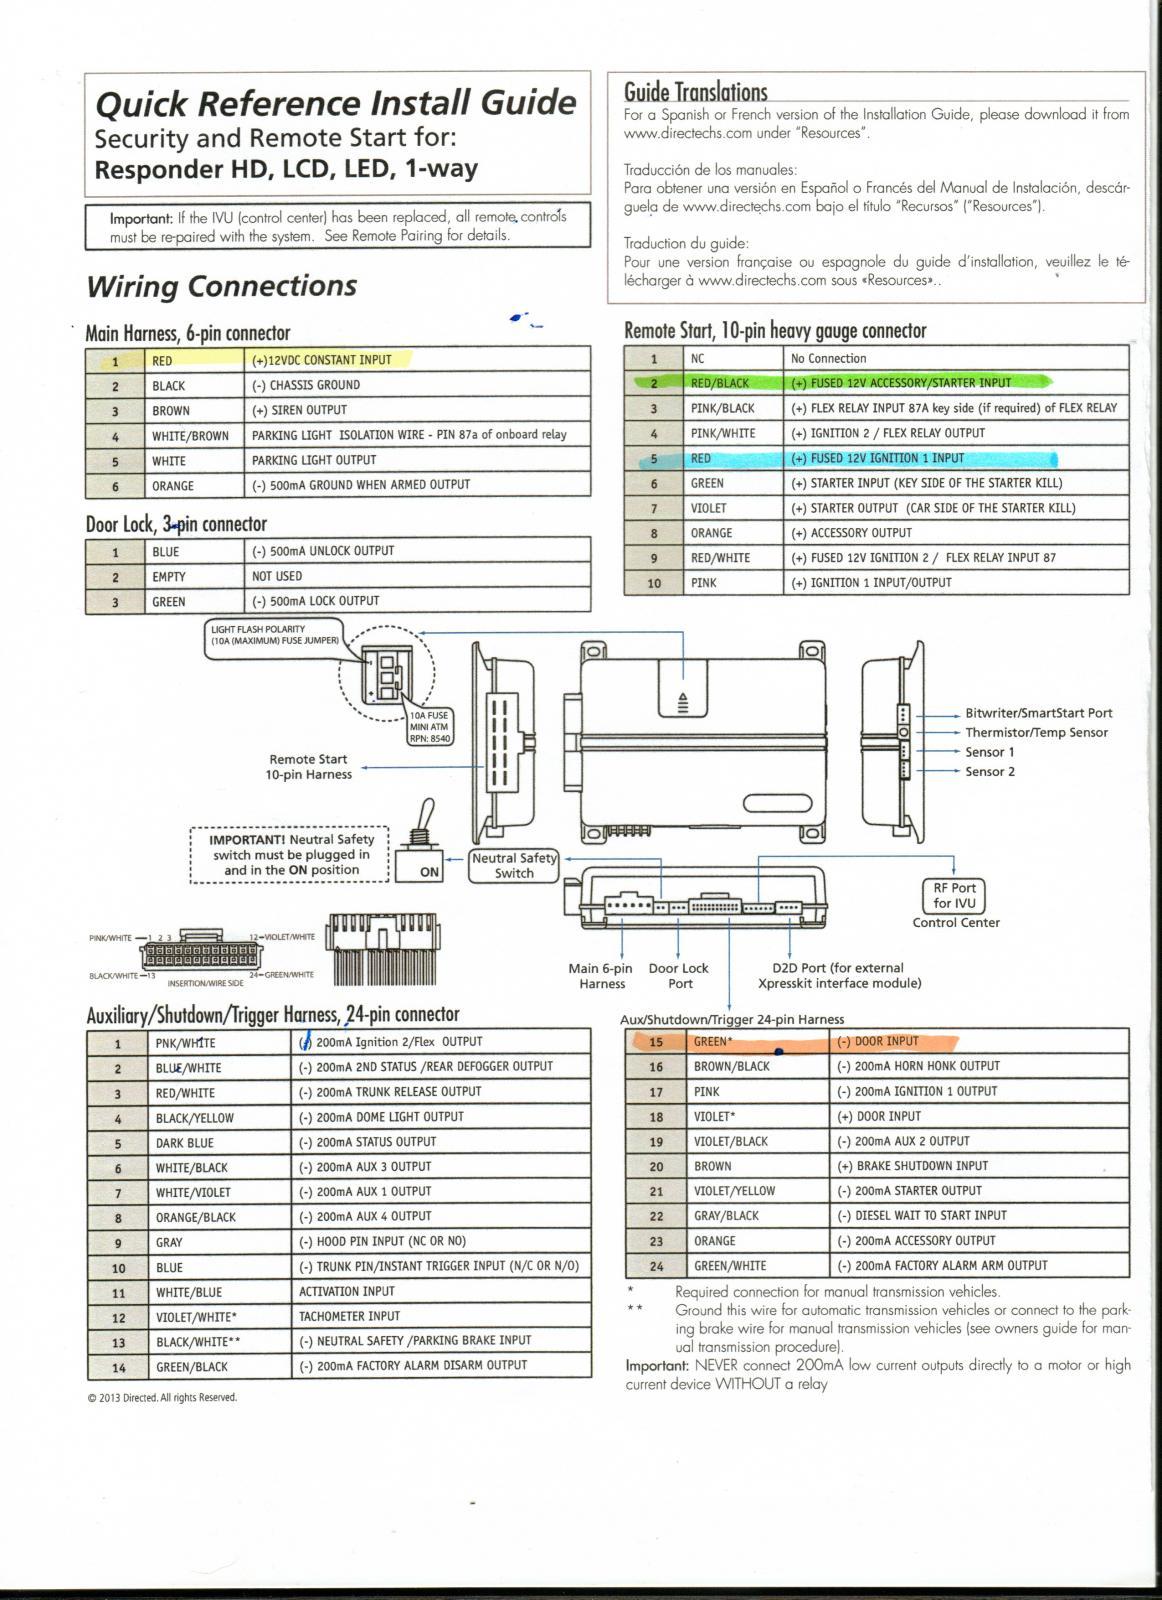 Viper Remote Start Wiring Diagram : viper, remote, start, wiring, diagram, DIAGRAM], Wiring, Diagram, Viper, 5701v, Version, Quality, GSPOTDIAGRAM.HOTELBALTICSENIGALLIA.IT